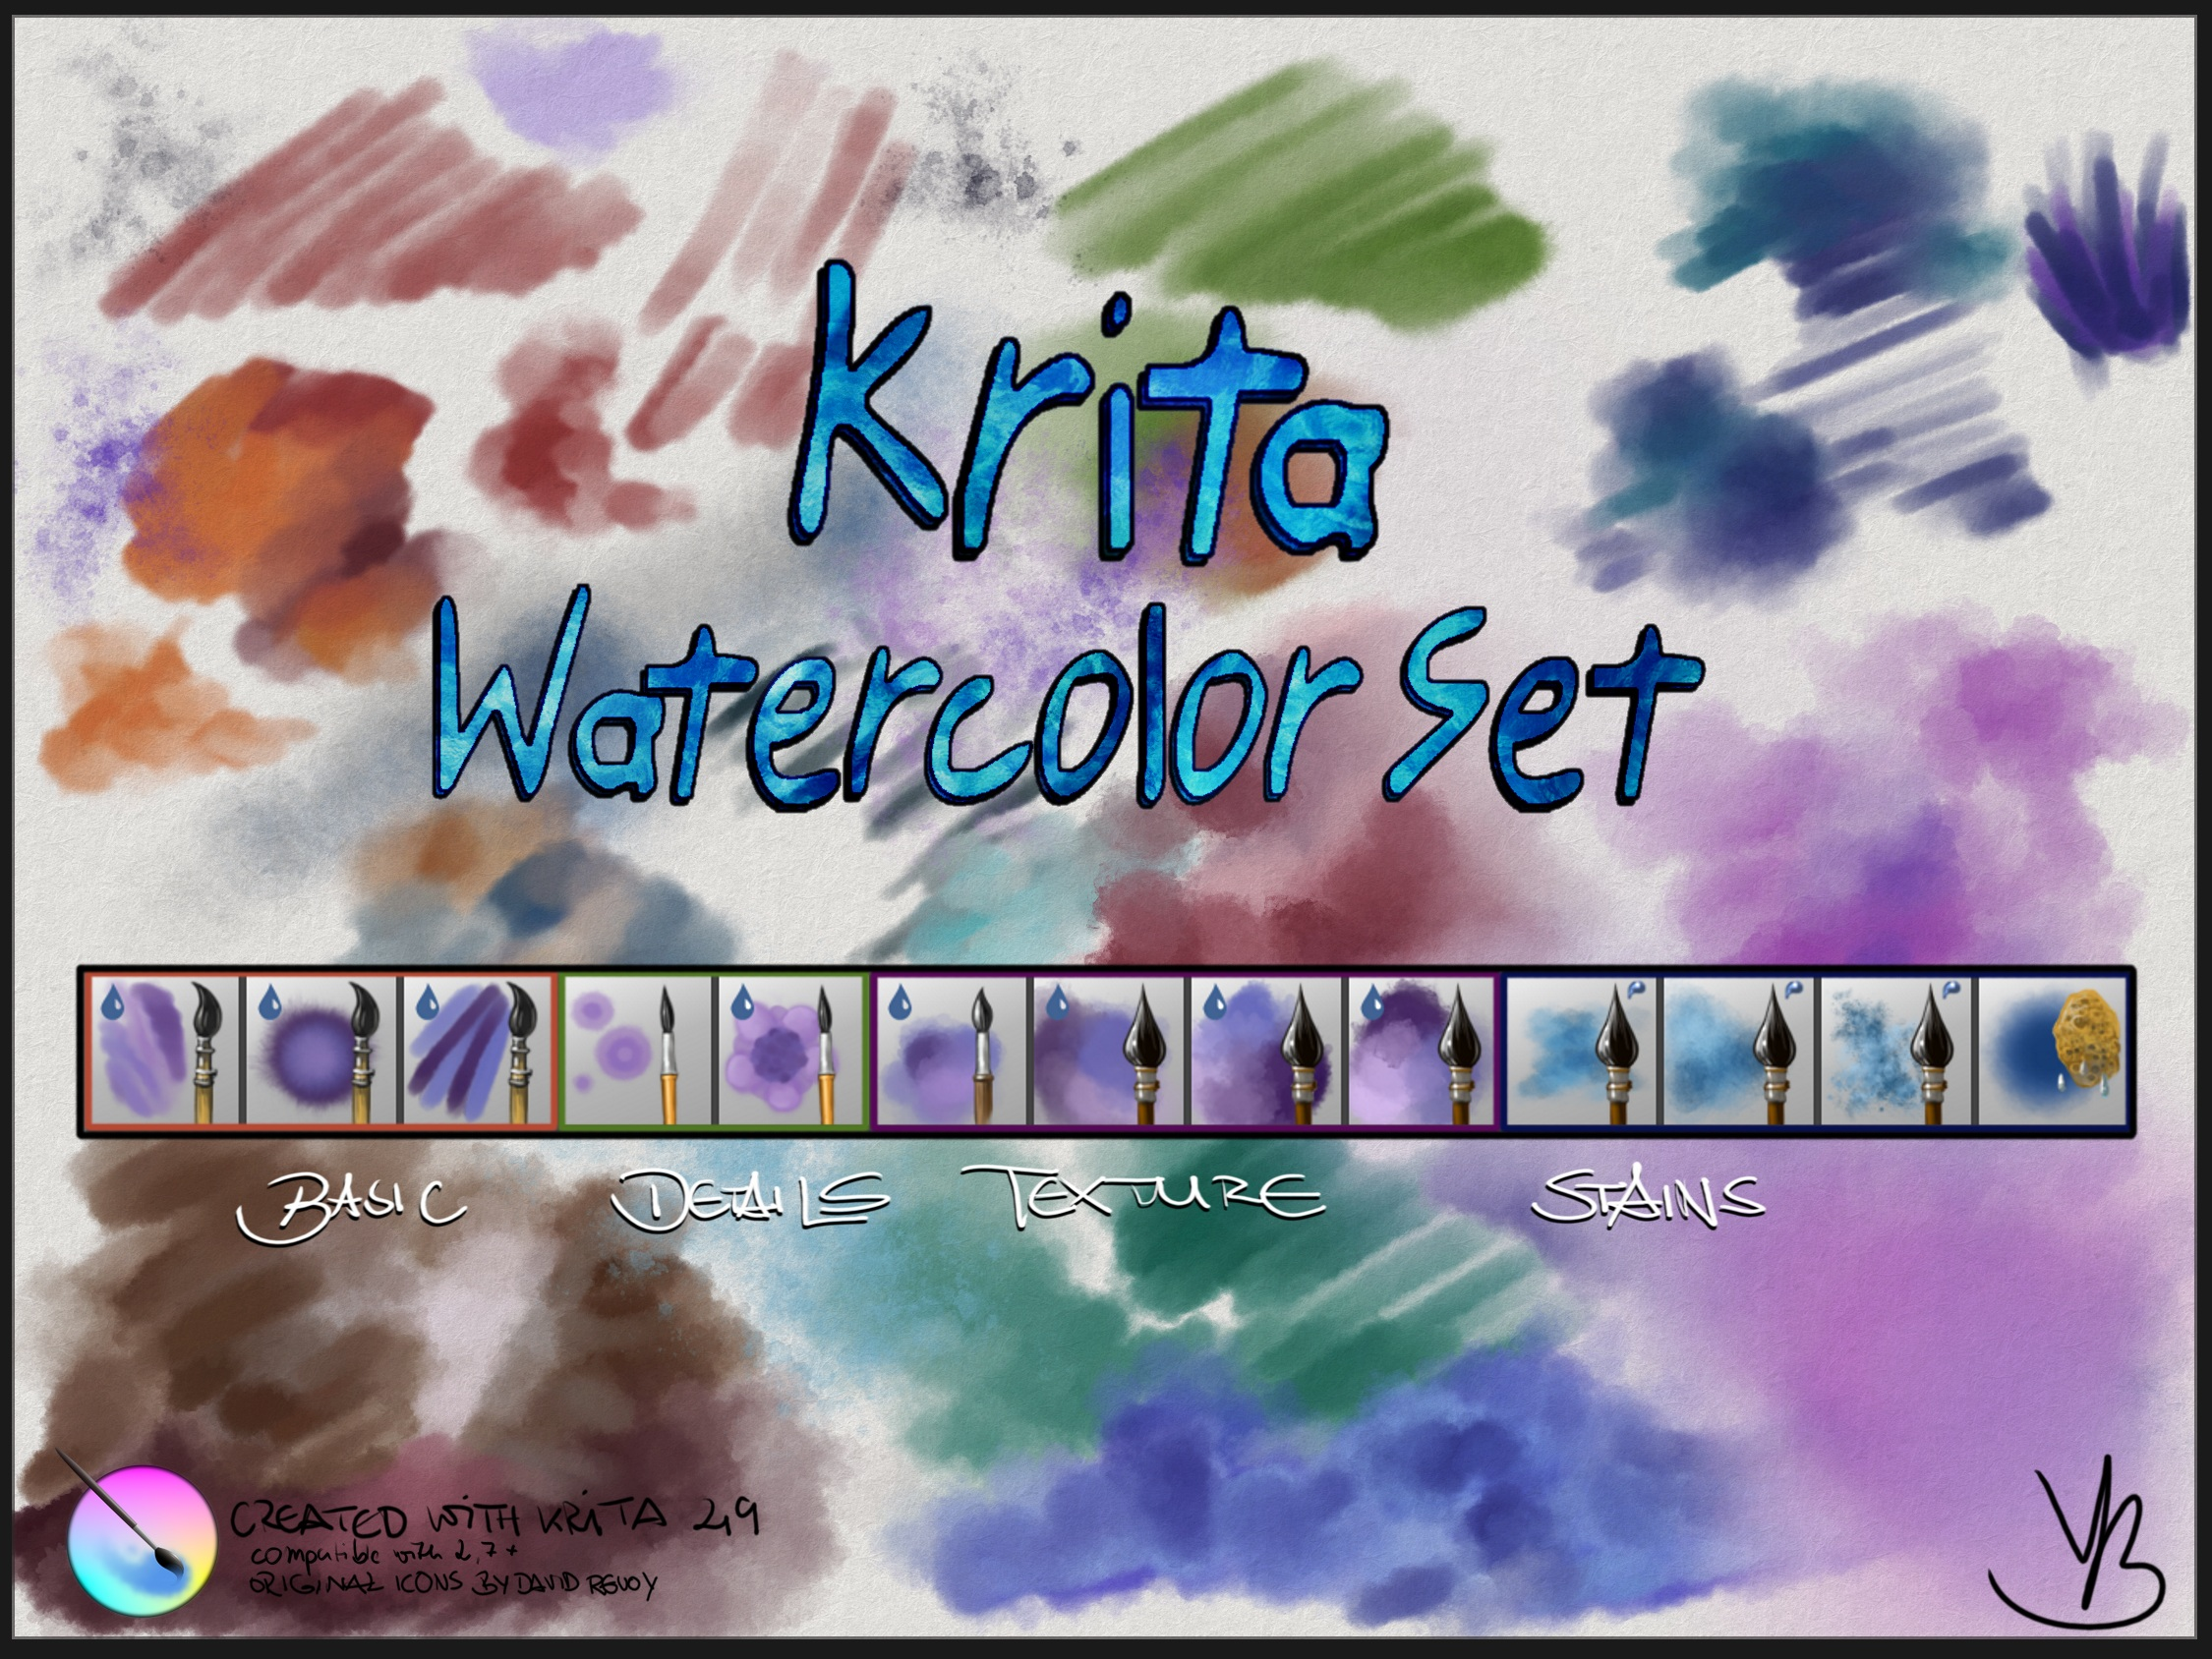 Krita Watercolor Set v1 01 by GrindGod on DeviantArt